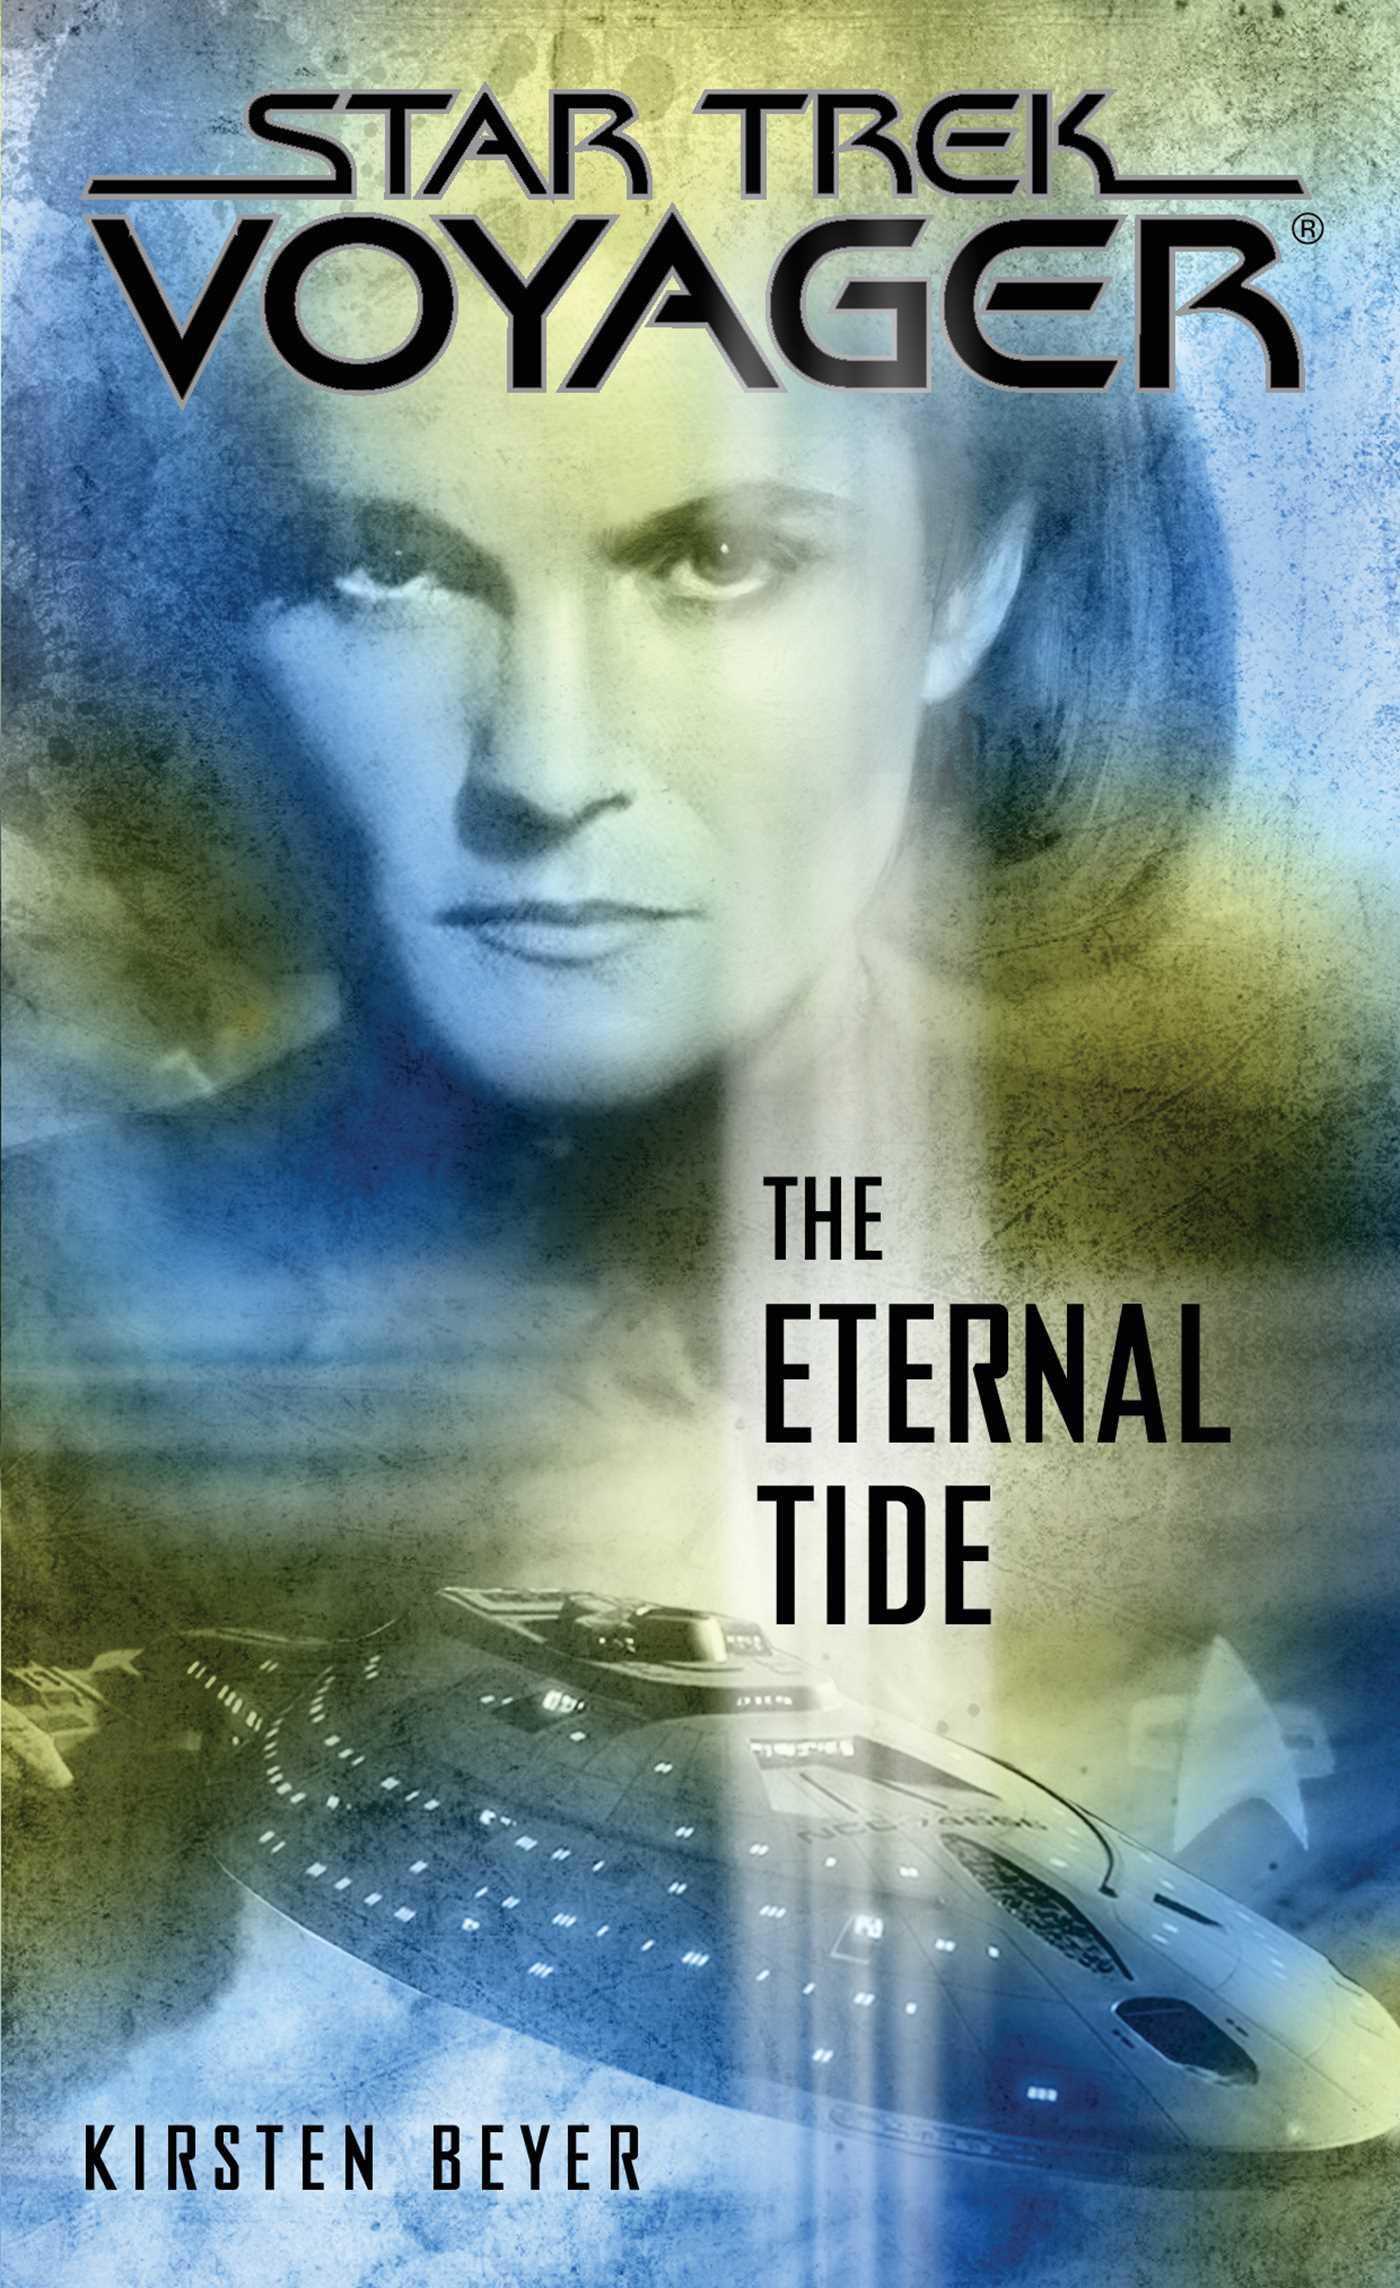 The eternal tide 9781451673241 hr